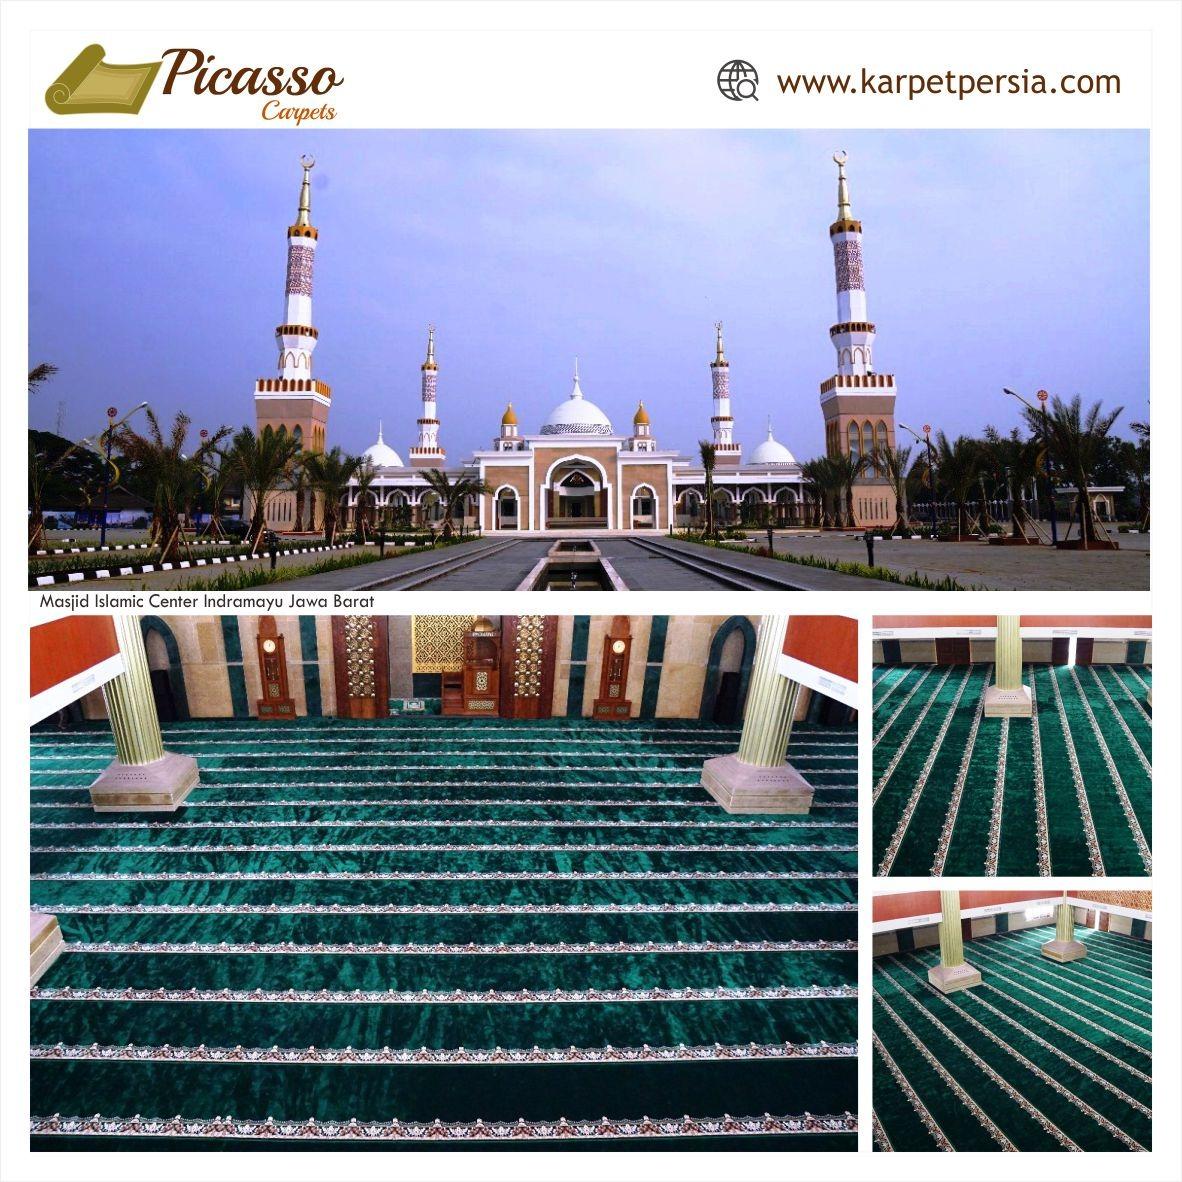 Karpet Masjid Islamic Center, Indramayu